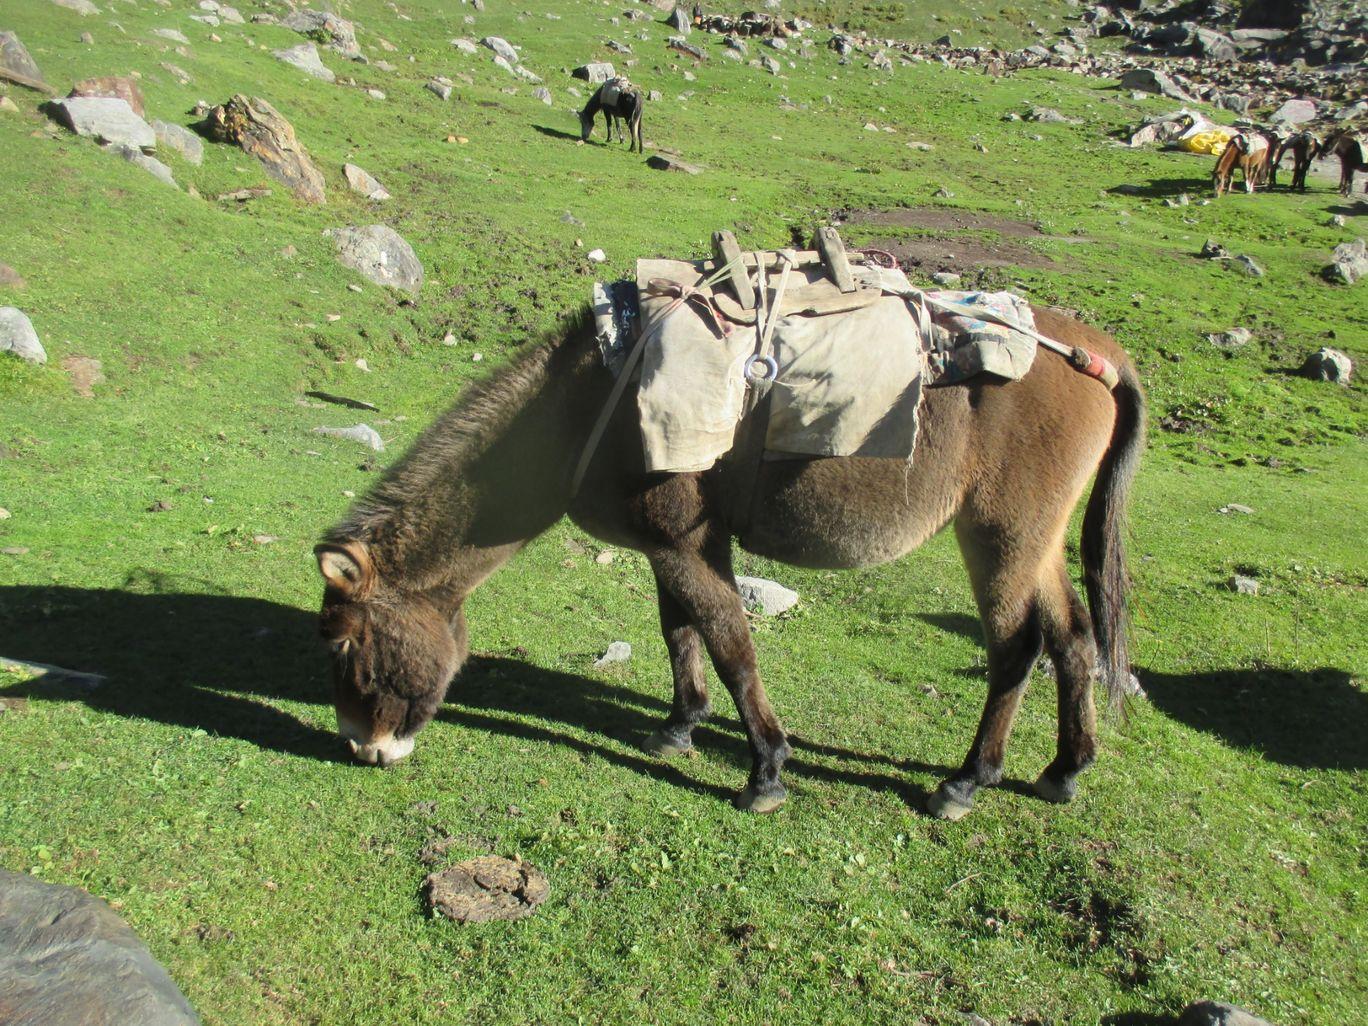 Photo of Himalayas By Preeti pal